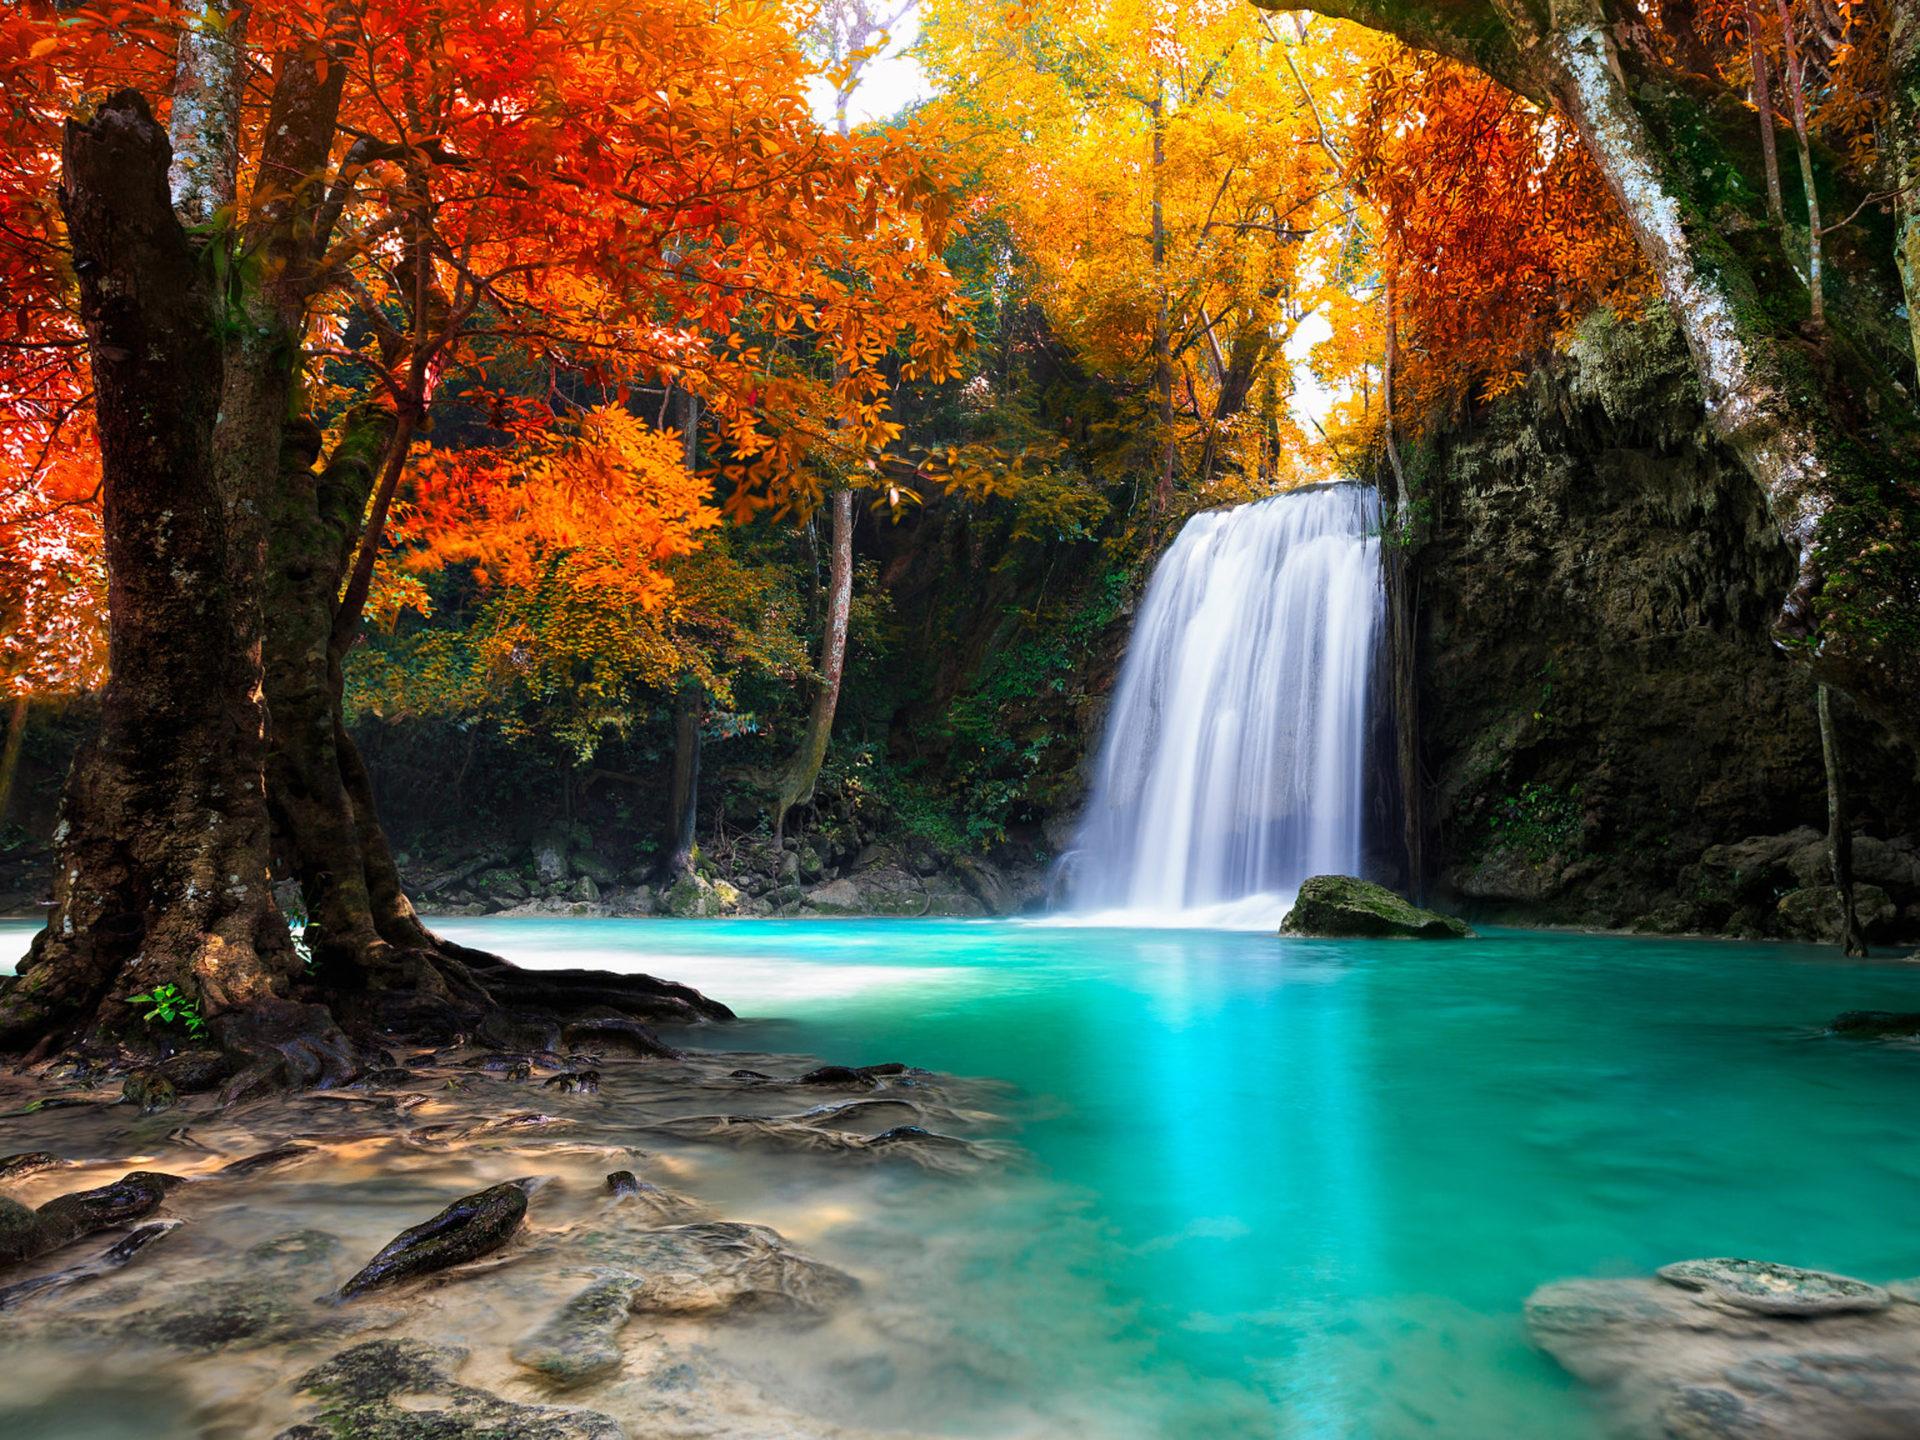 Natural Hd Wallpaper Download For Android Waterfall In Kanjanaburi Thailand Landscapes Wallpaper